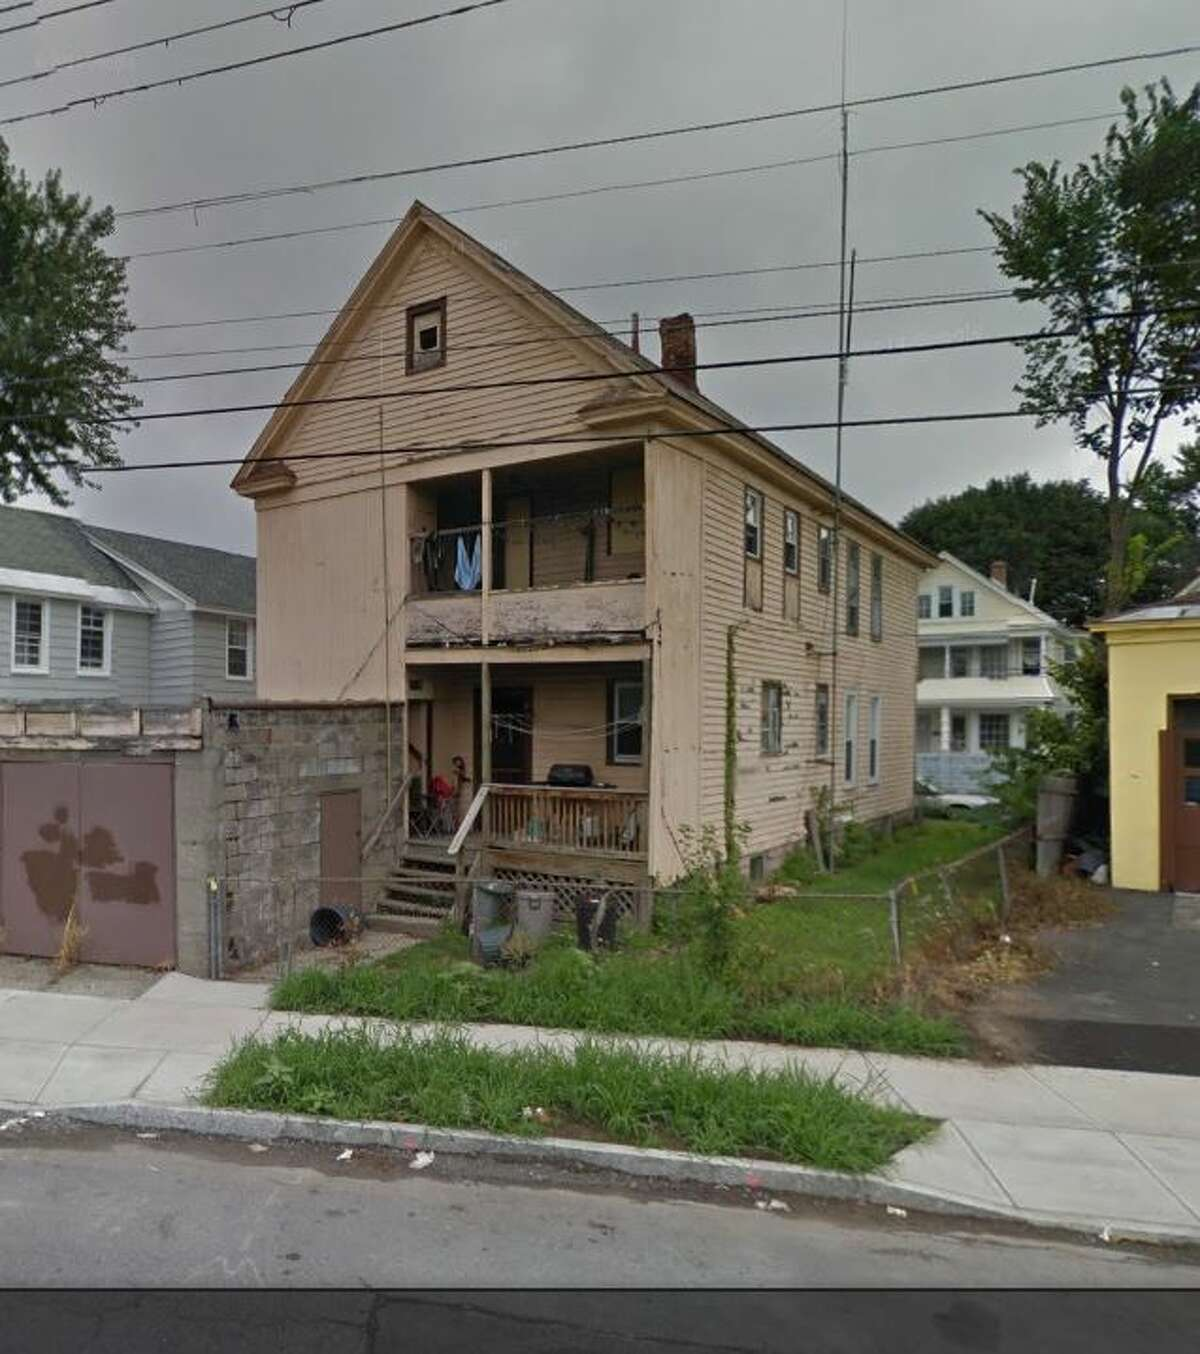 321 Duane Ave., Schenectady, $23,000 (Google Maps)